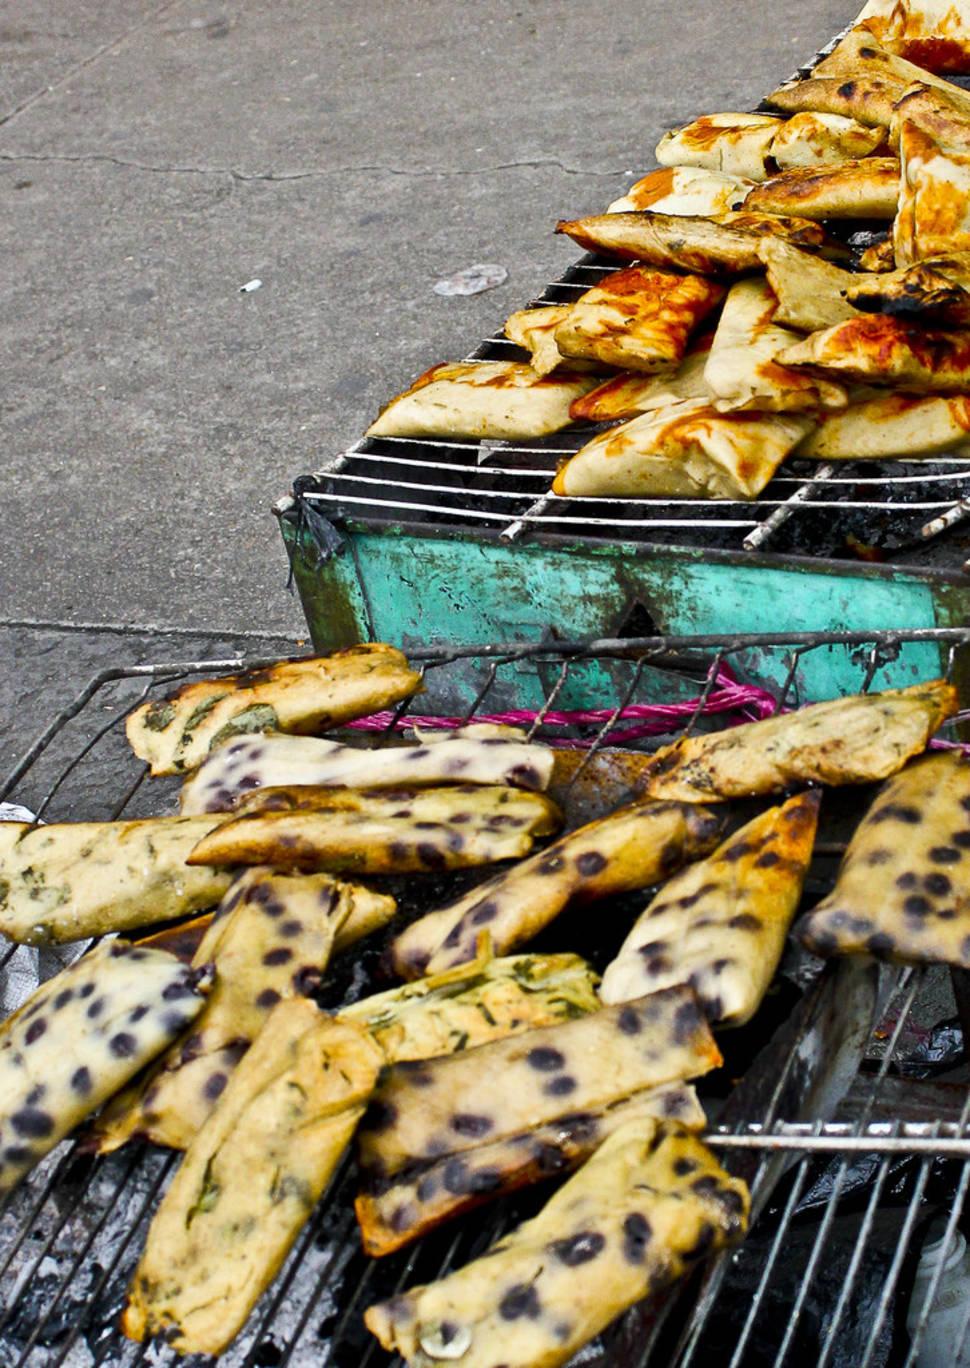 Tamales in Guatemala - Best Season